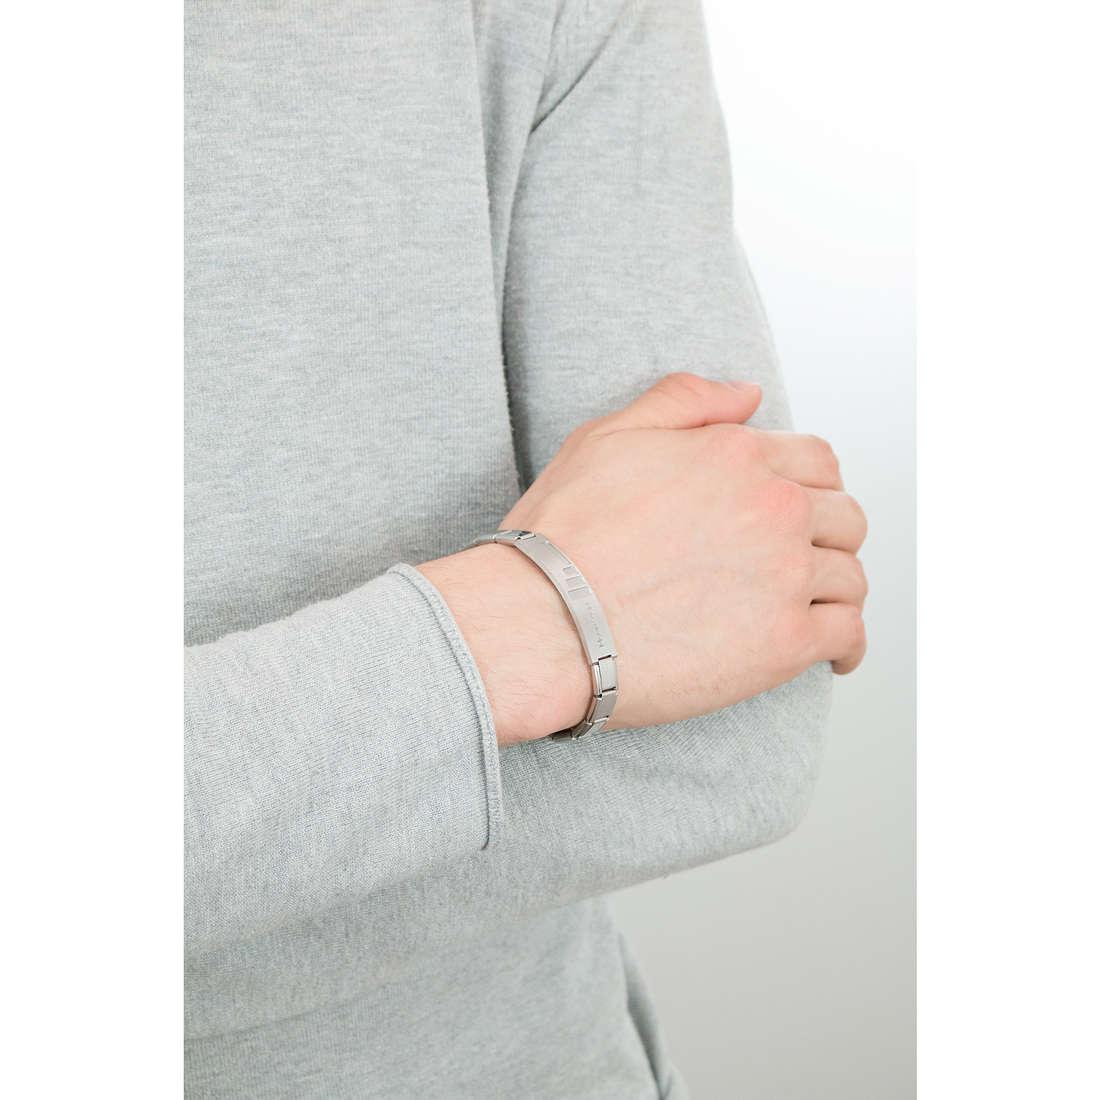 Nomination bracciali Trendsetter uomo 021108/008/003 indosso